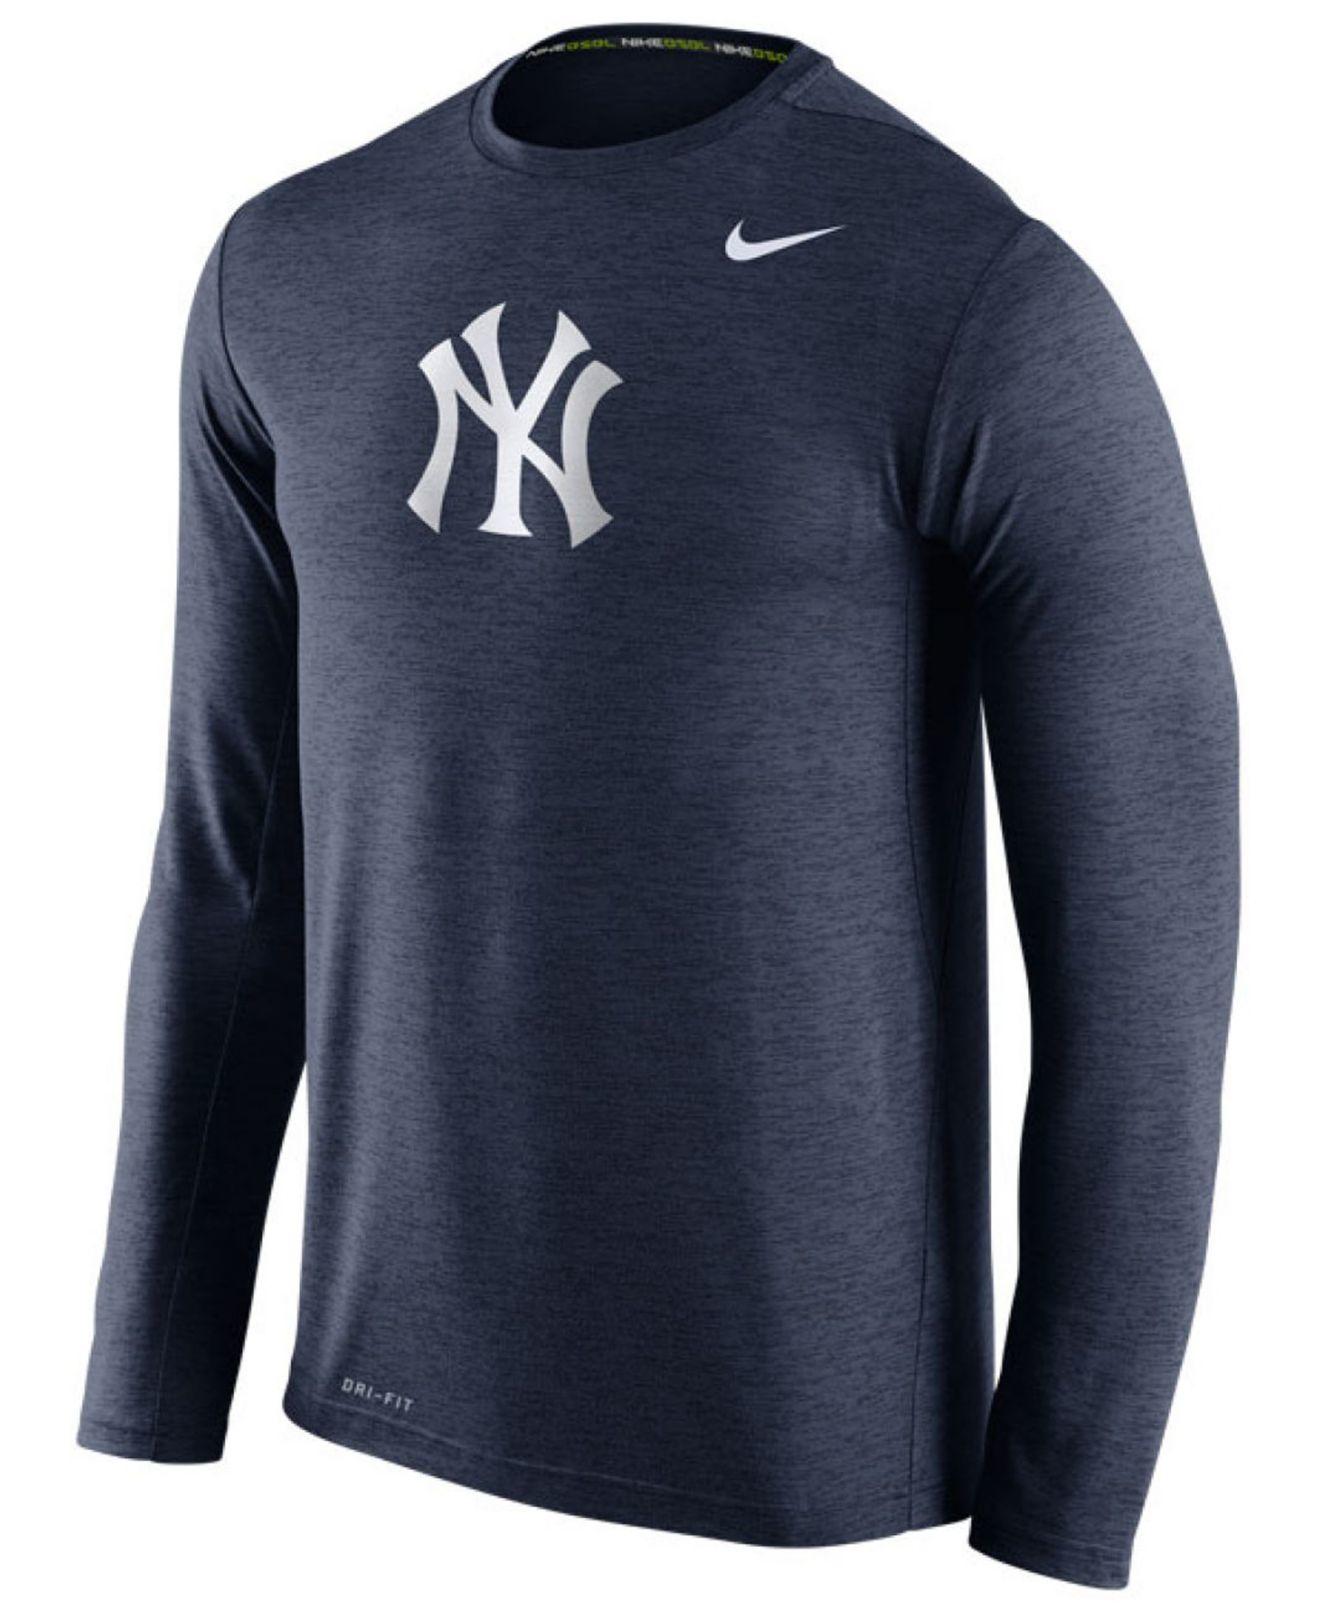 2d5522212 T Shirts New York Yankees - BCD Tofu House